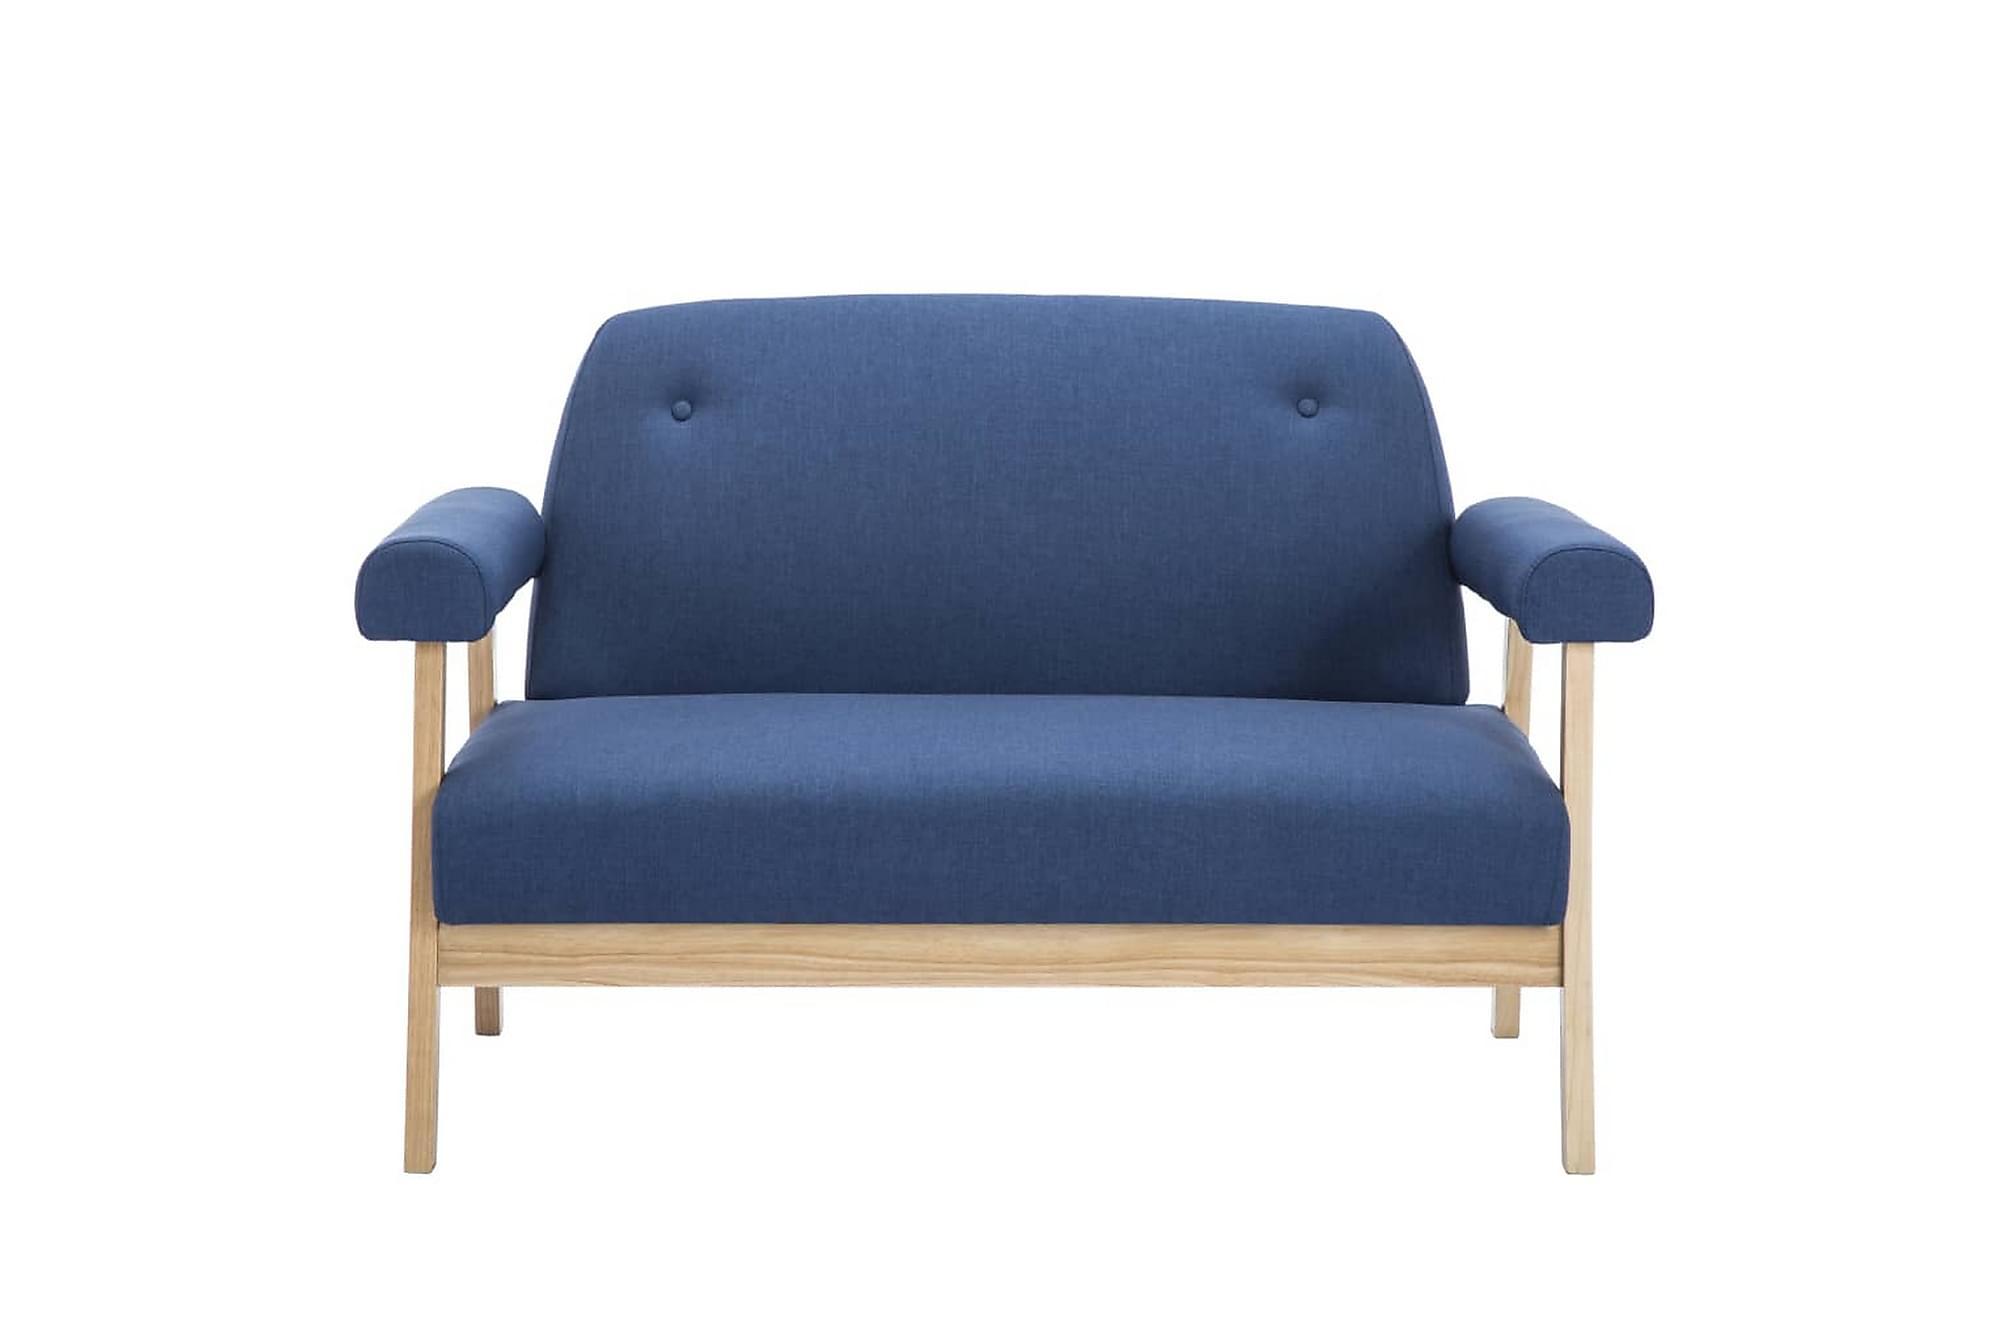 2-sitssoffa tyg blå, 2-sits soffor